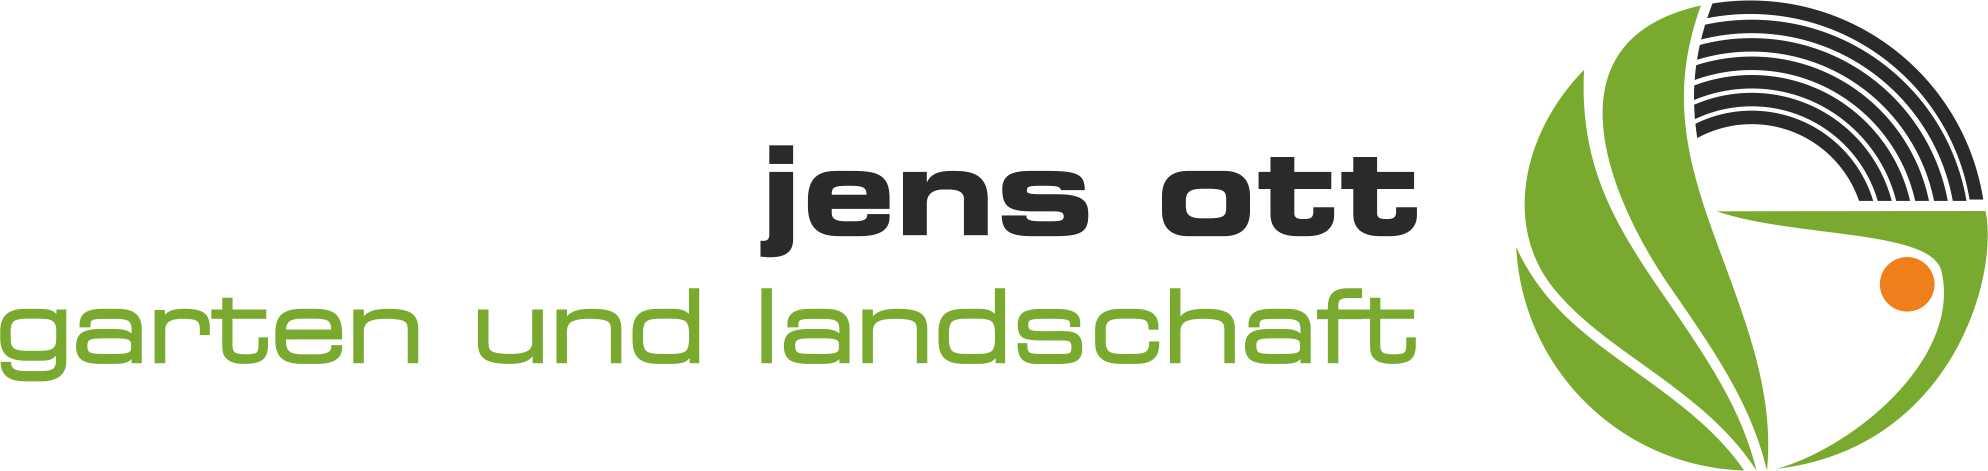 ott_jens_logo_redesign_rgb_0614